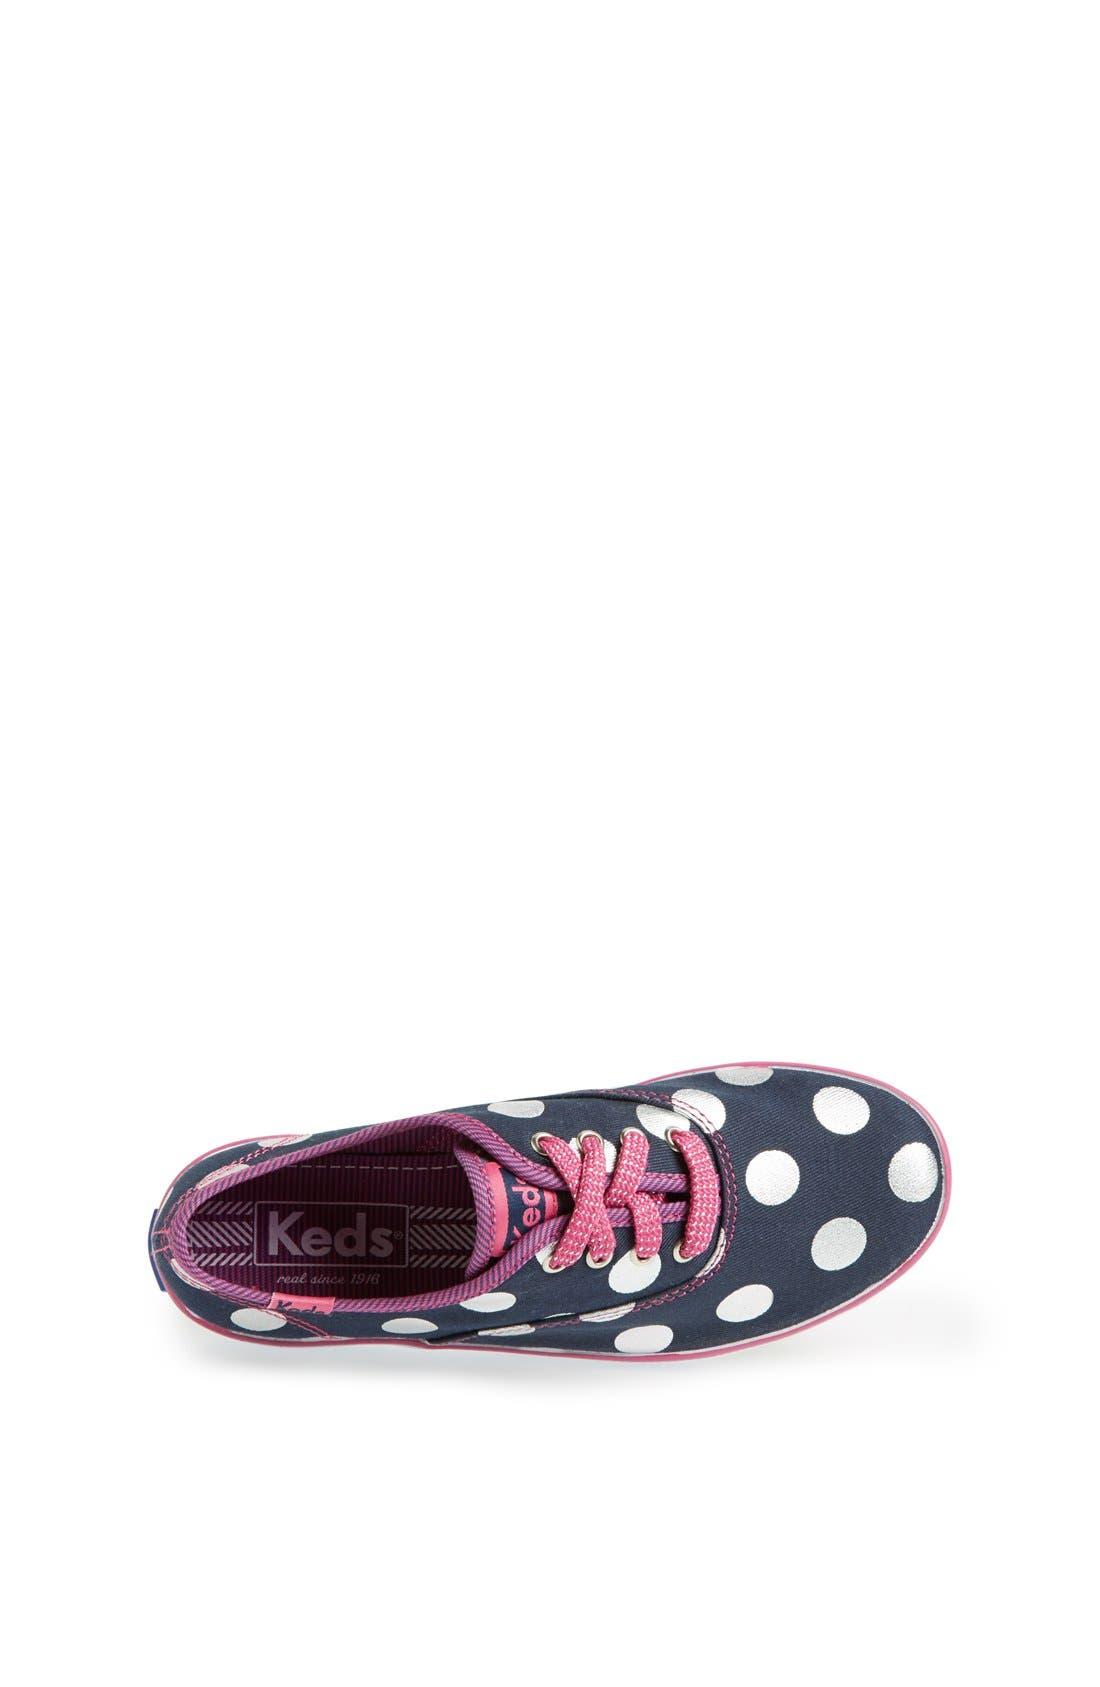 Alternate Image 3  - Keds® 'Champion' Polka Dot Sneaker (Walker, Toddler, Little Kid & Big Kid)